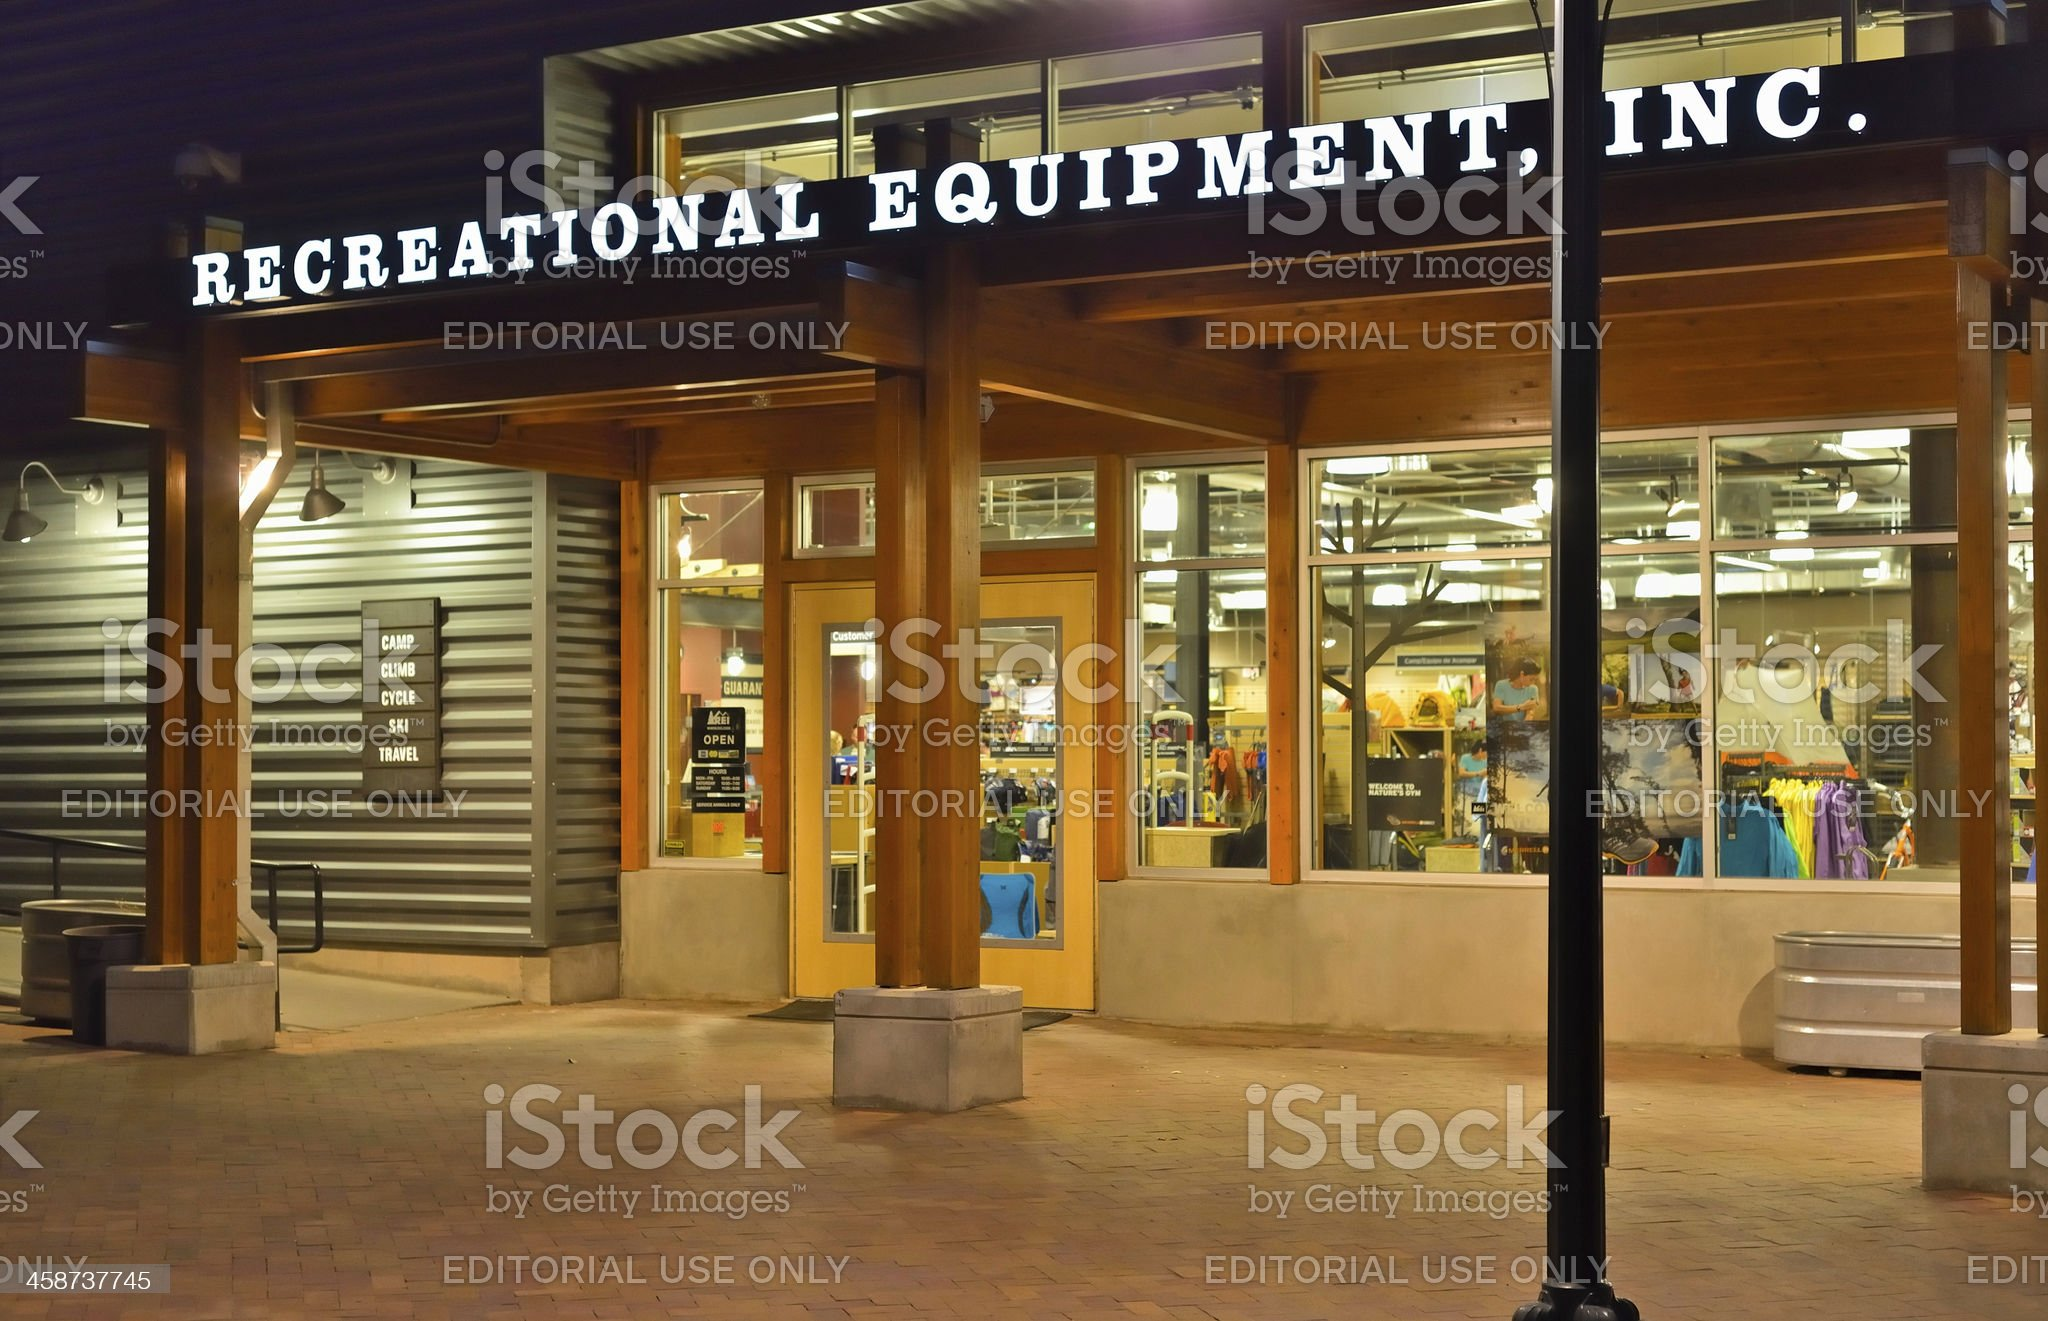 Recreational Equipment, INC, REI royalty-free stock photo